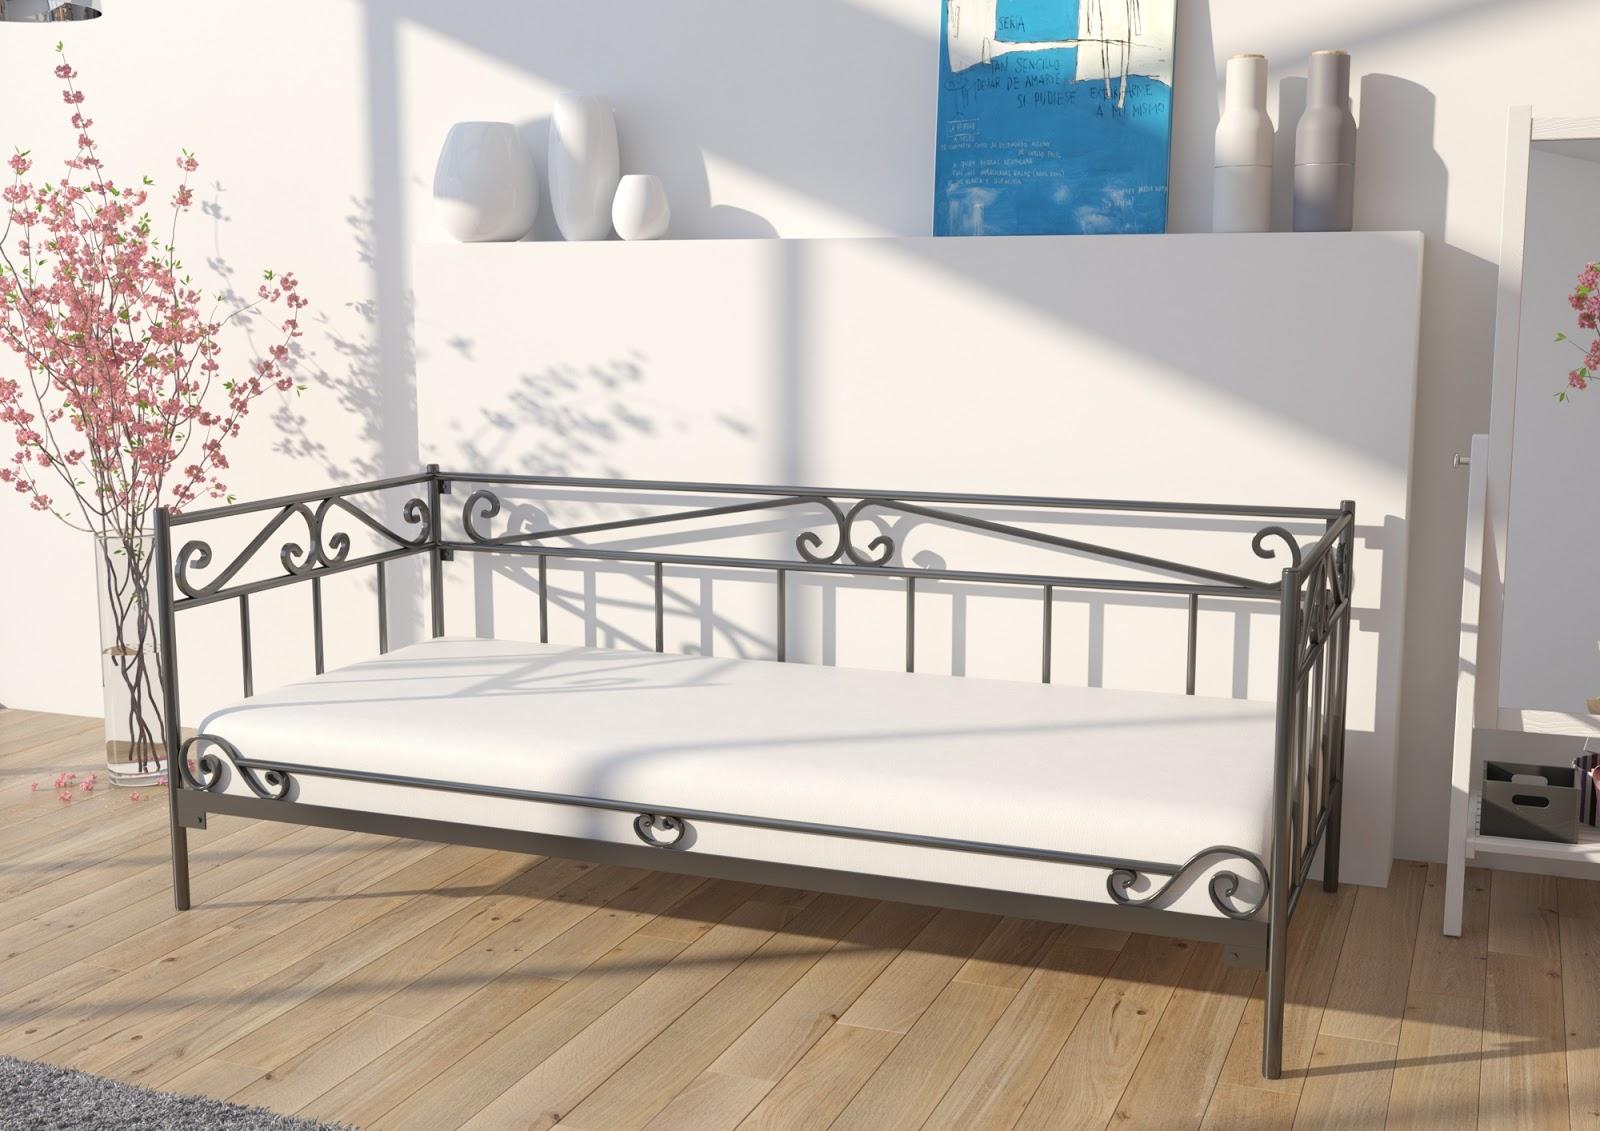 Łóżko metalowe sofa wzór 21